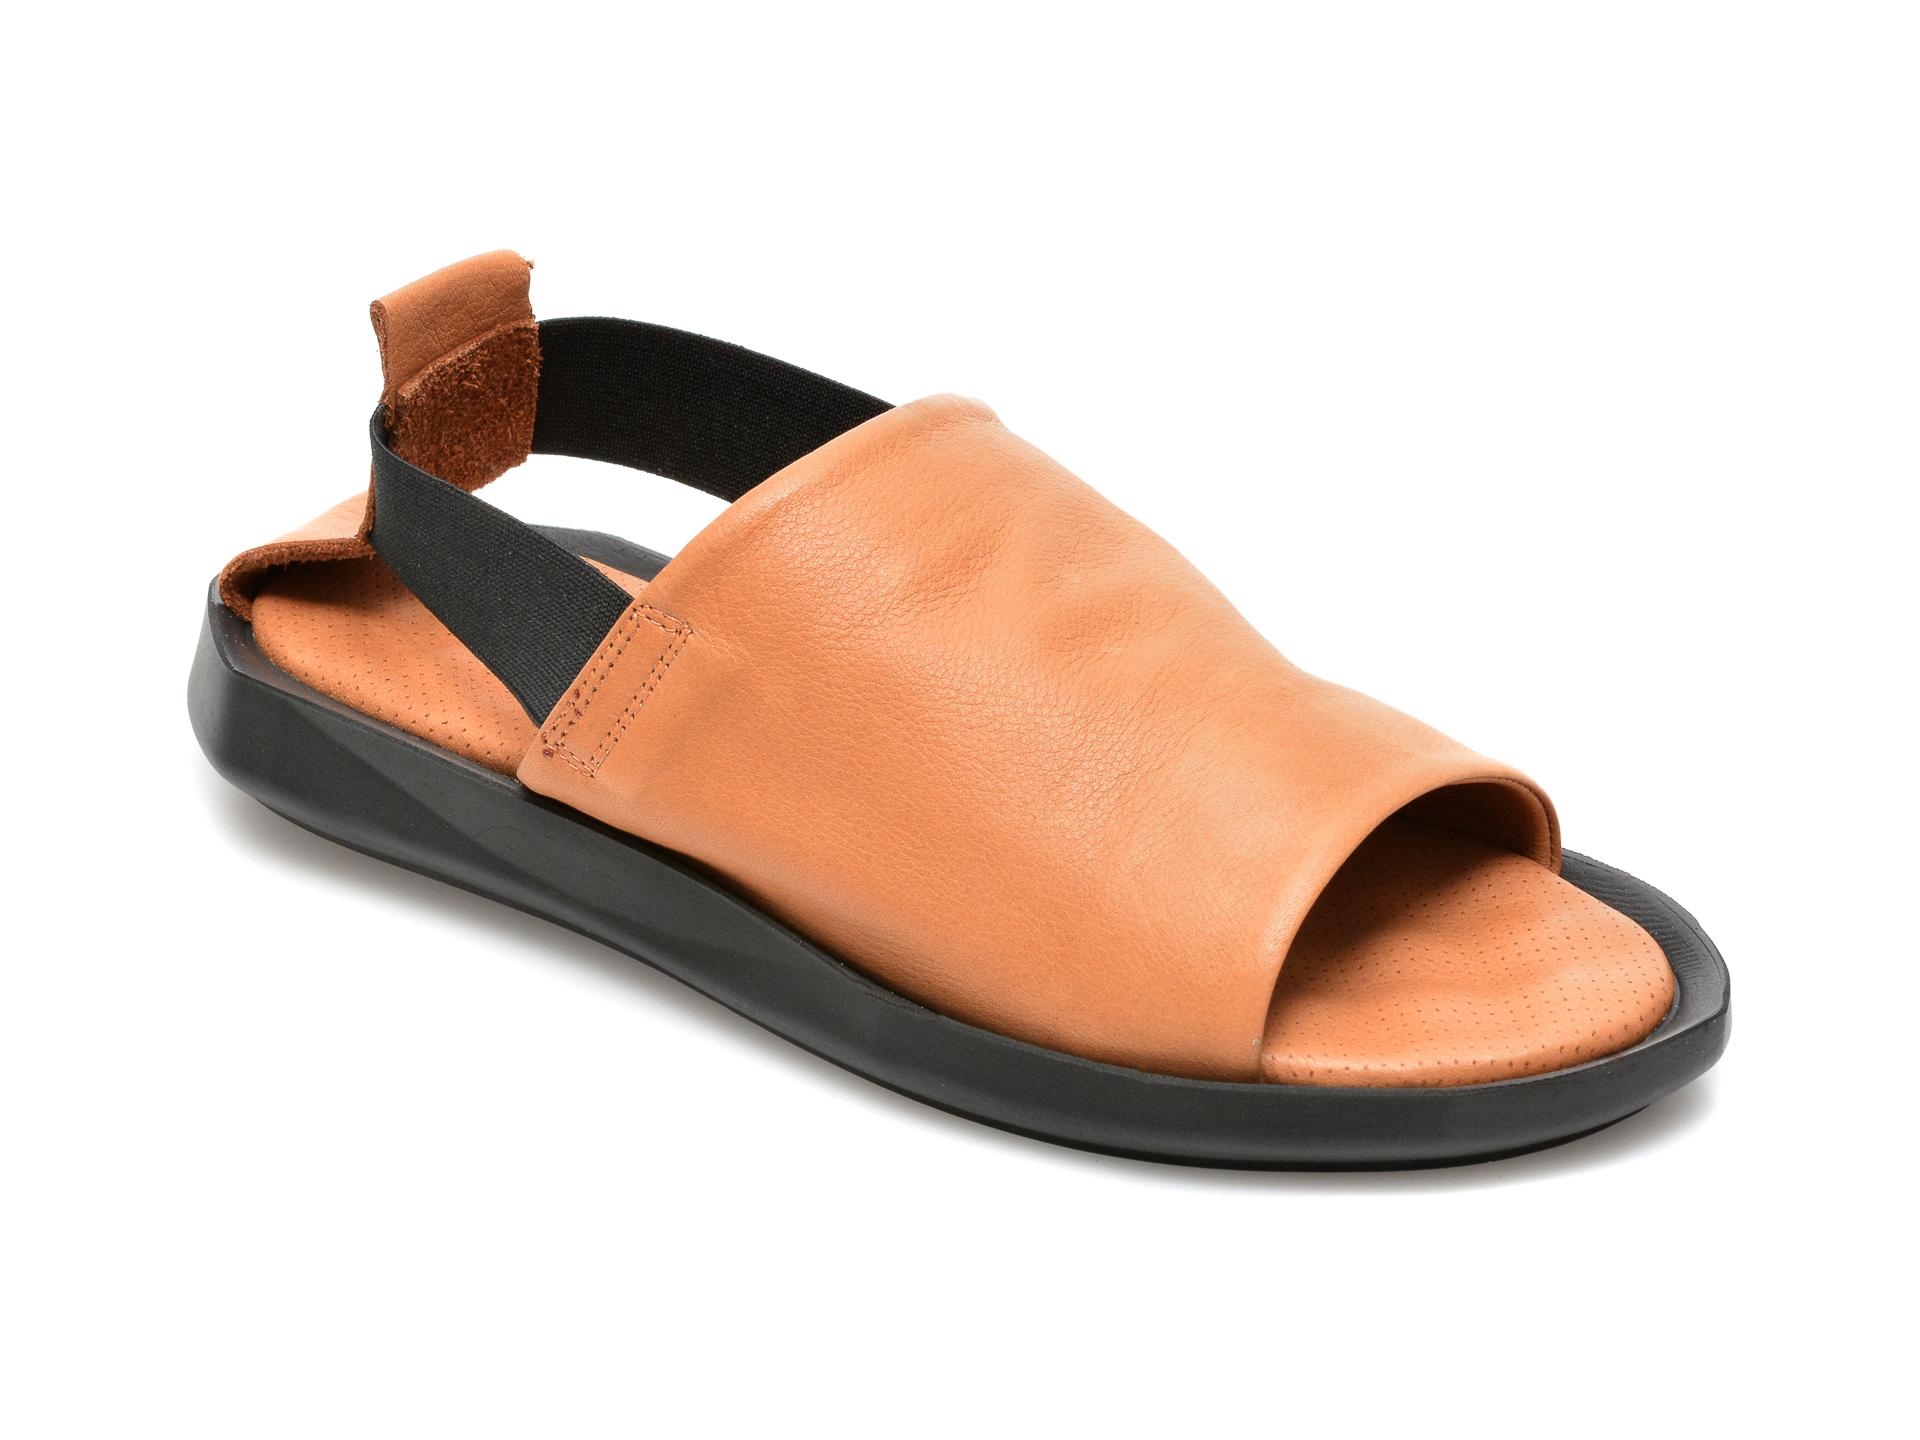 Sandale FLAVIA PASSINI maro, 42641, din piele naturala imagine otter.ro 2021